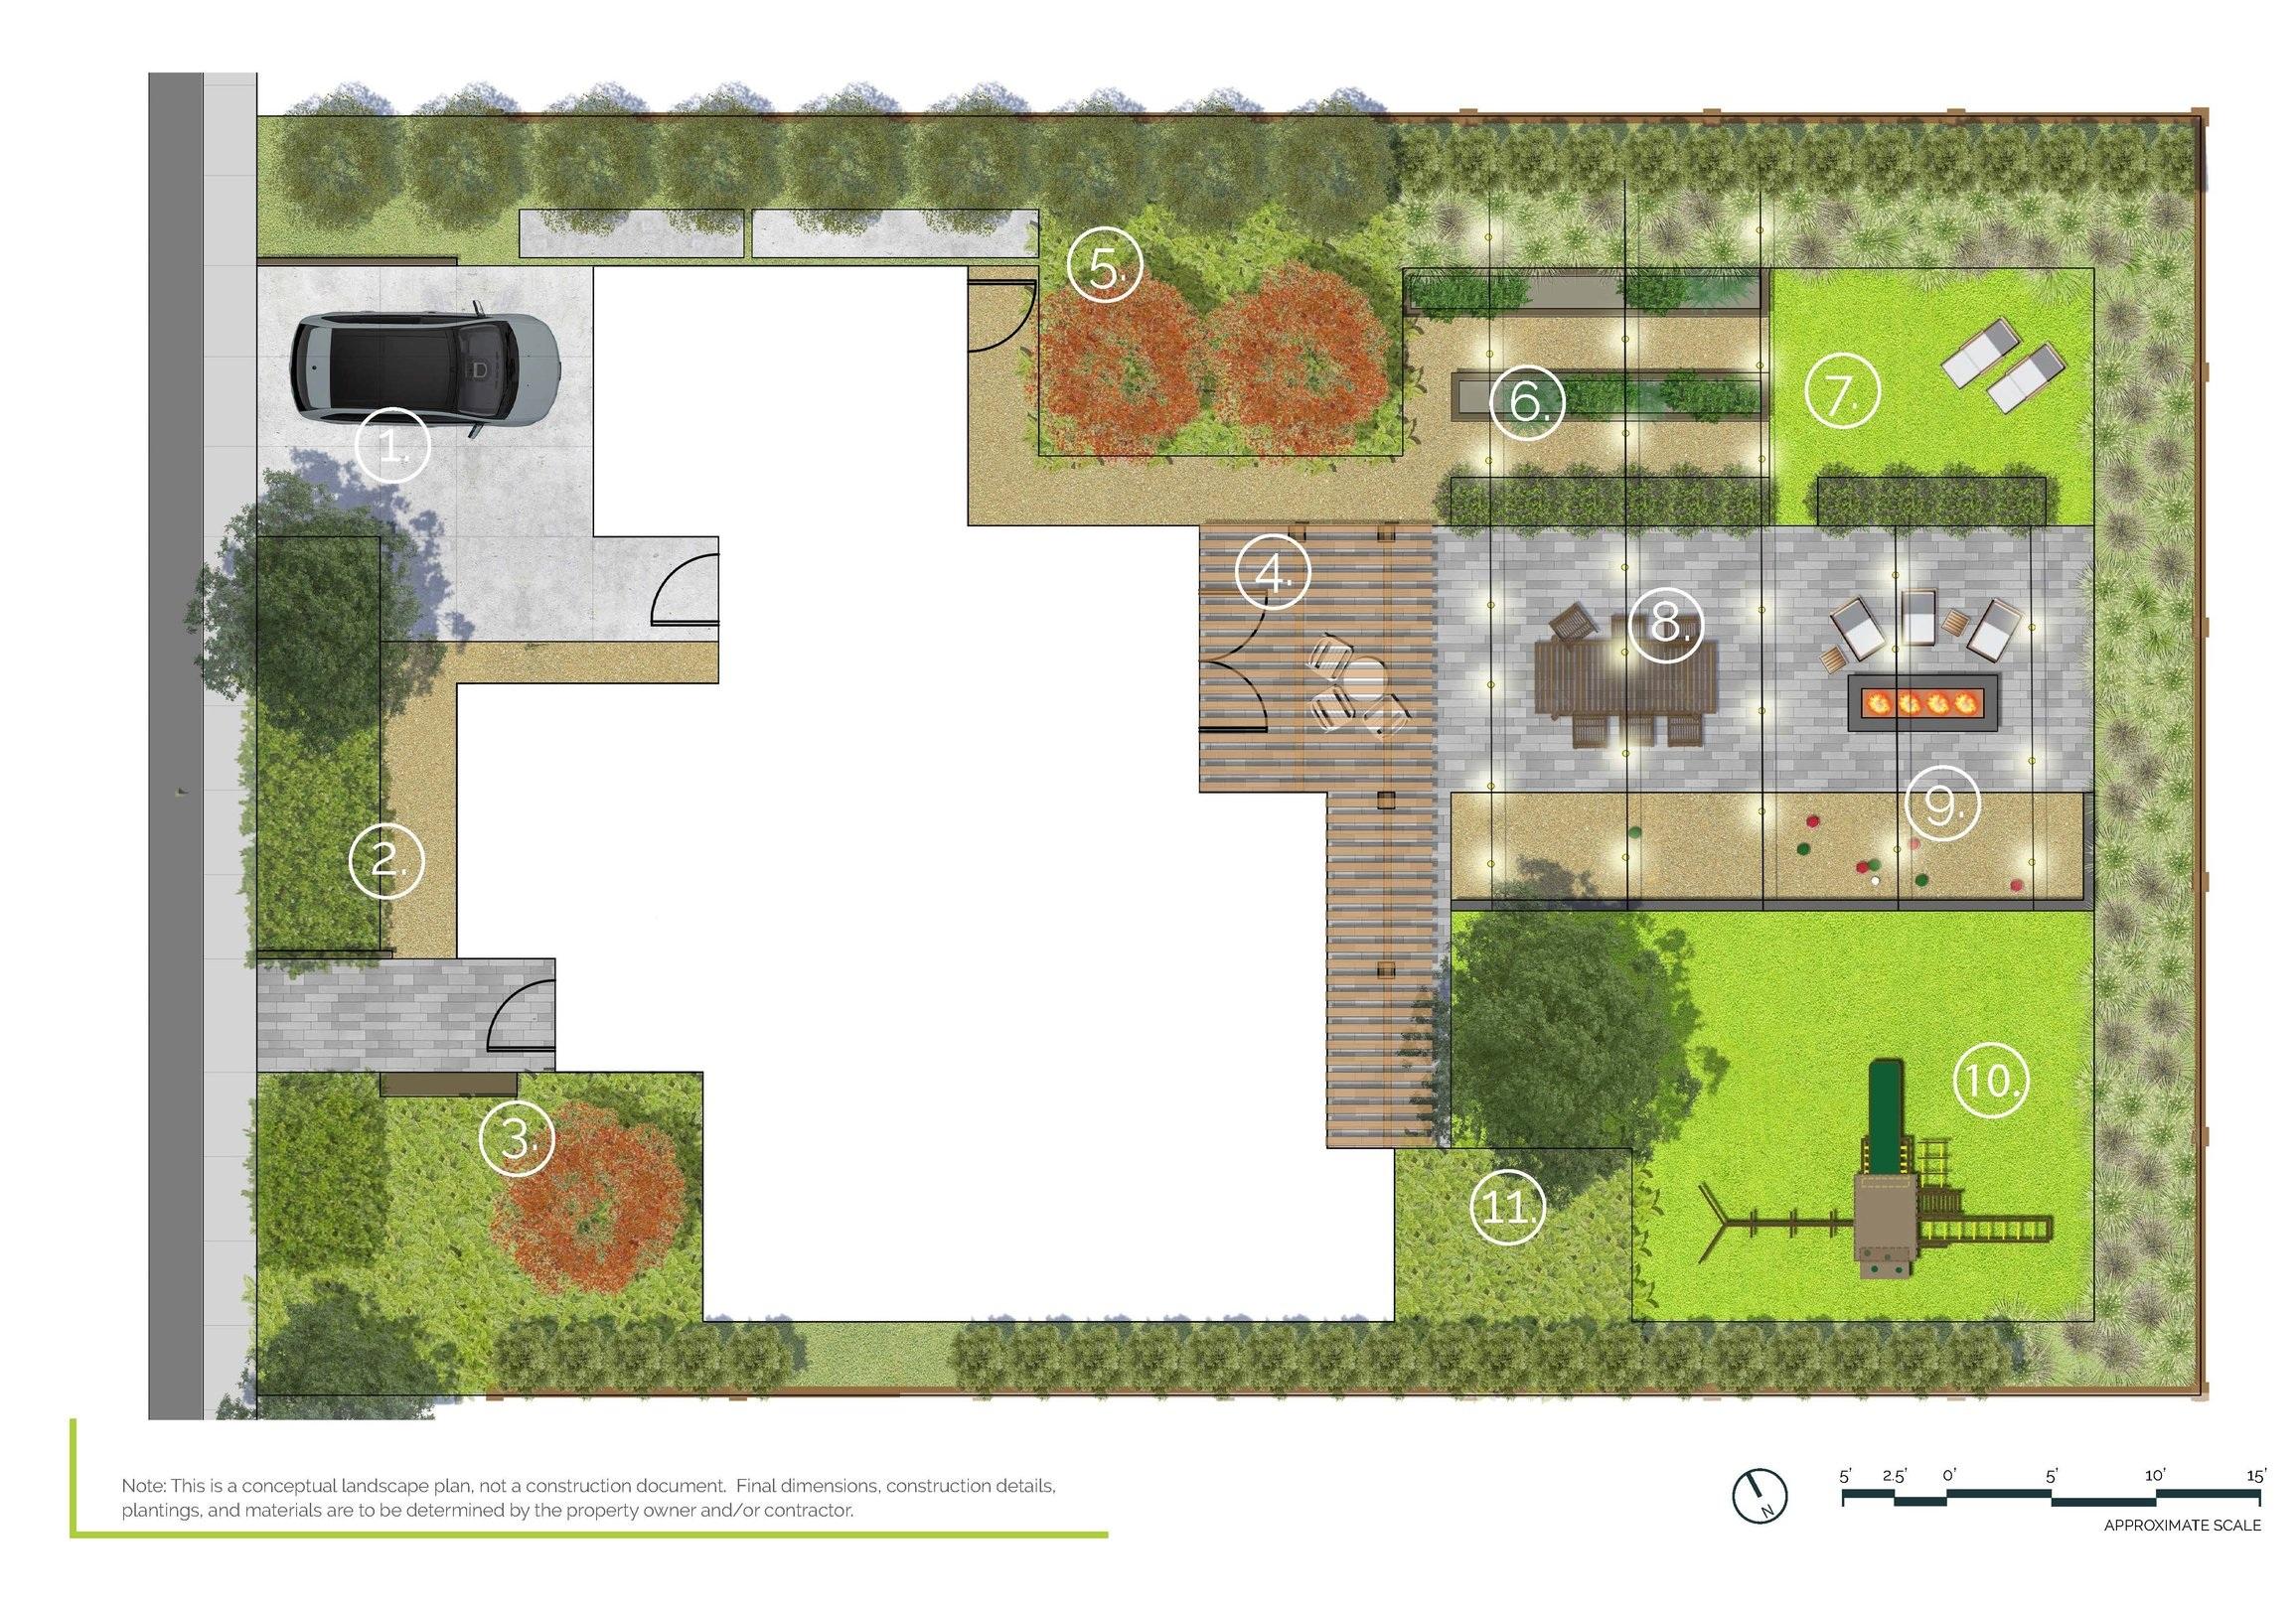 PortlandEntertainmentGarden - Full Property PlanPortland, OR